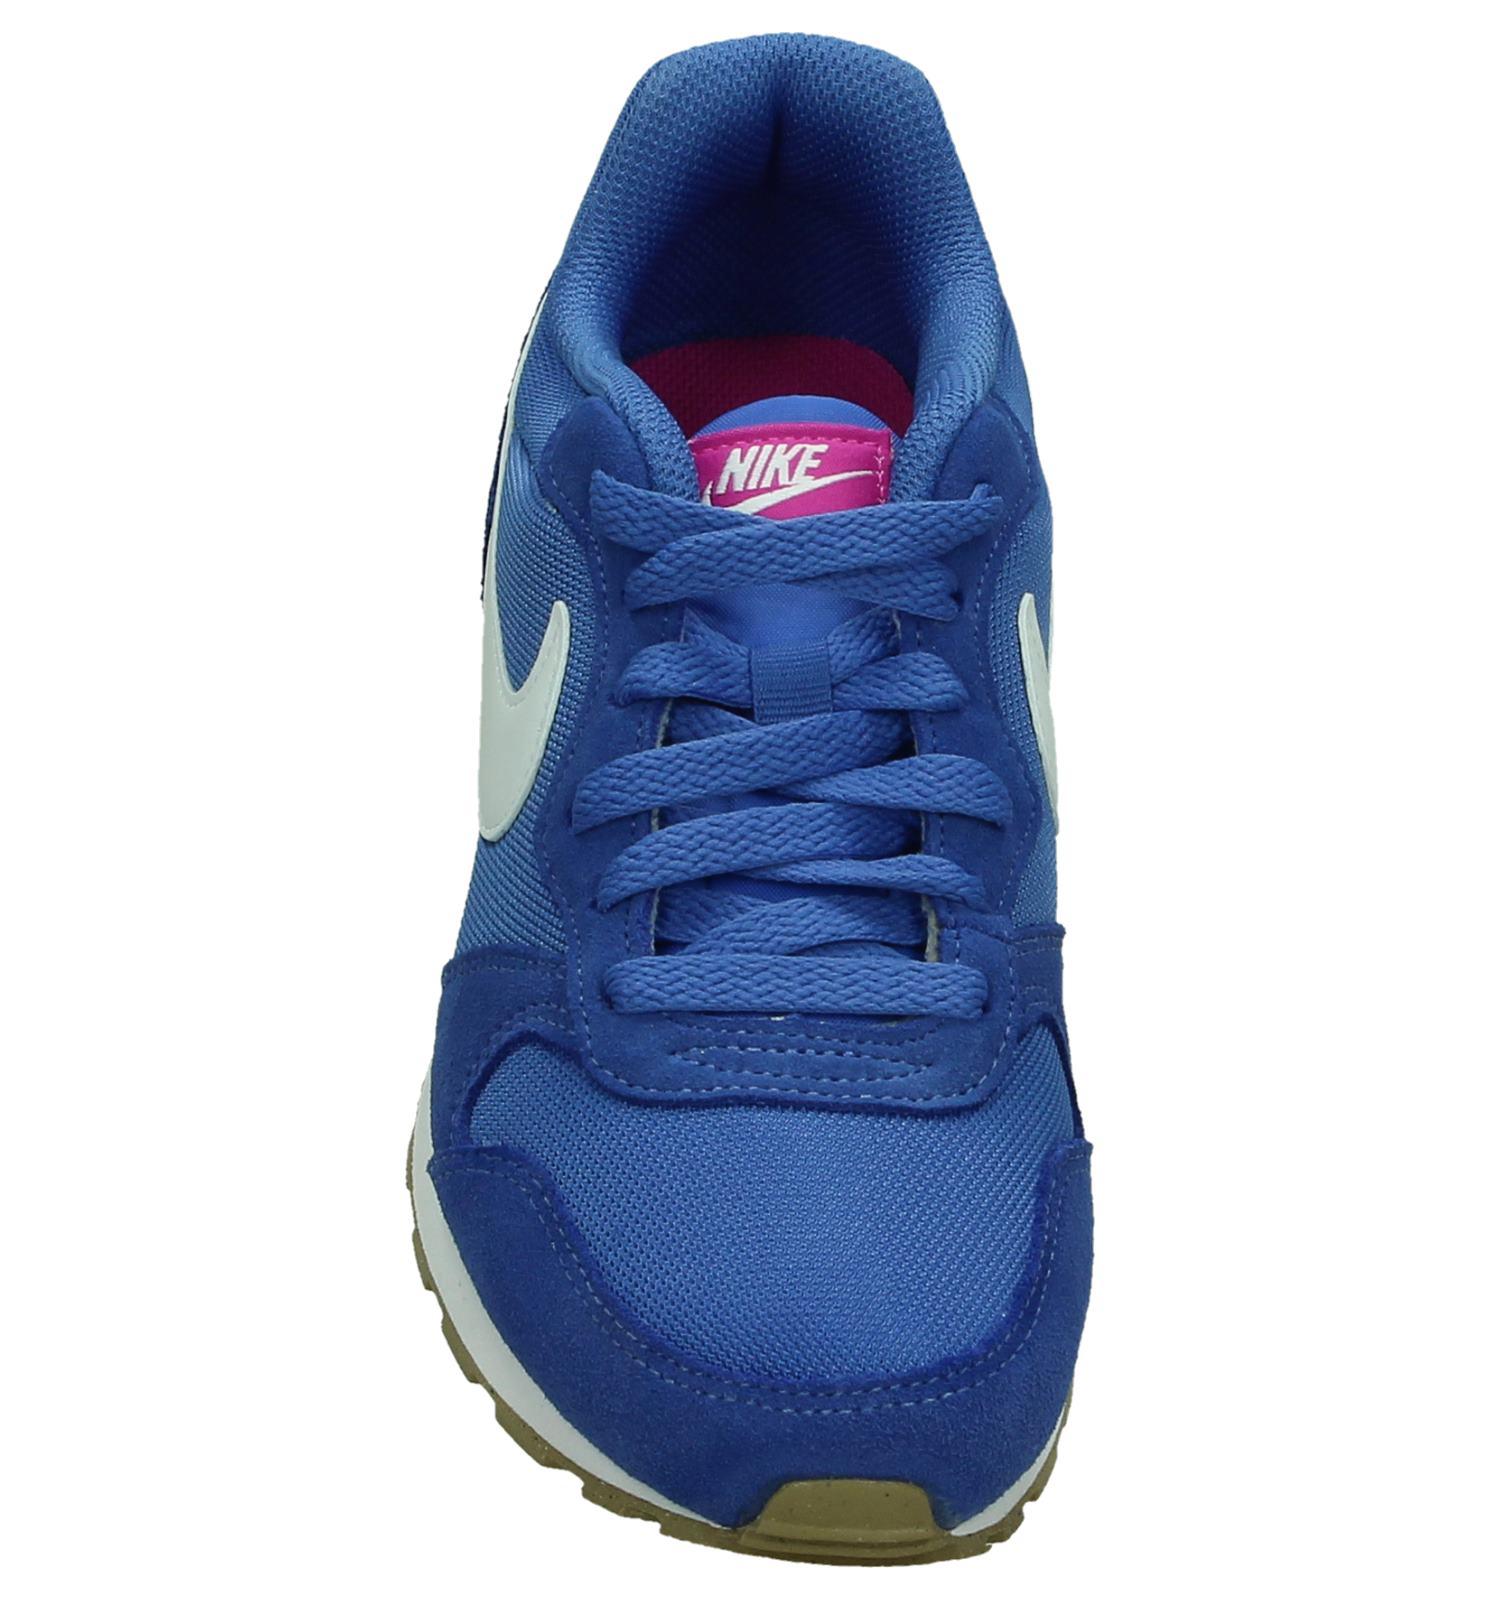 6343caecca8 Nike MD Runner Lage Sportieve Sneaker Blauw   TORFS.BE   Gratis verzend en  retour